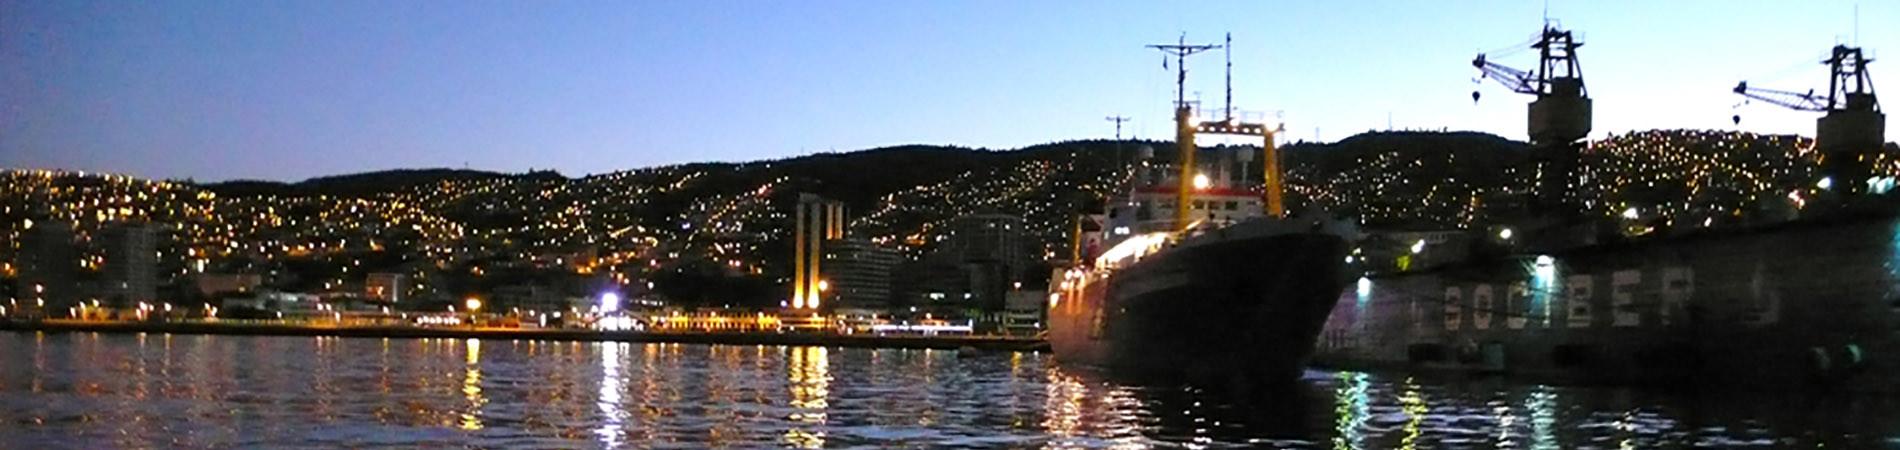 Valparaiso - RETE